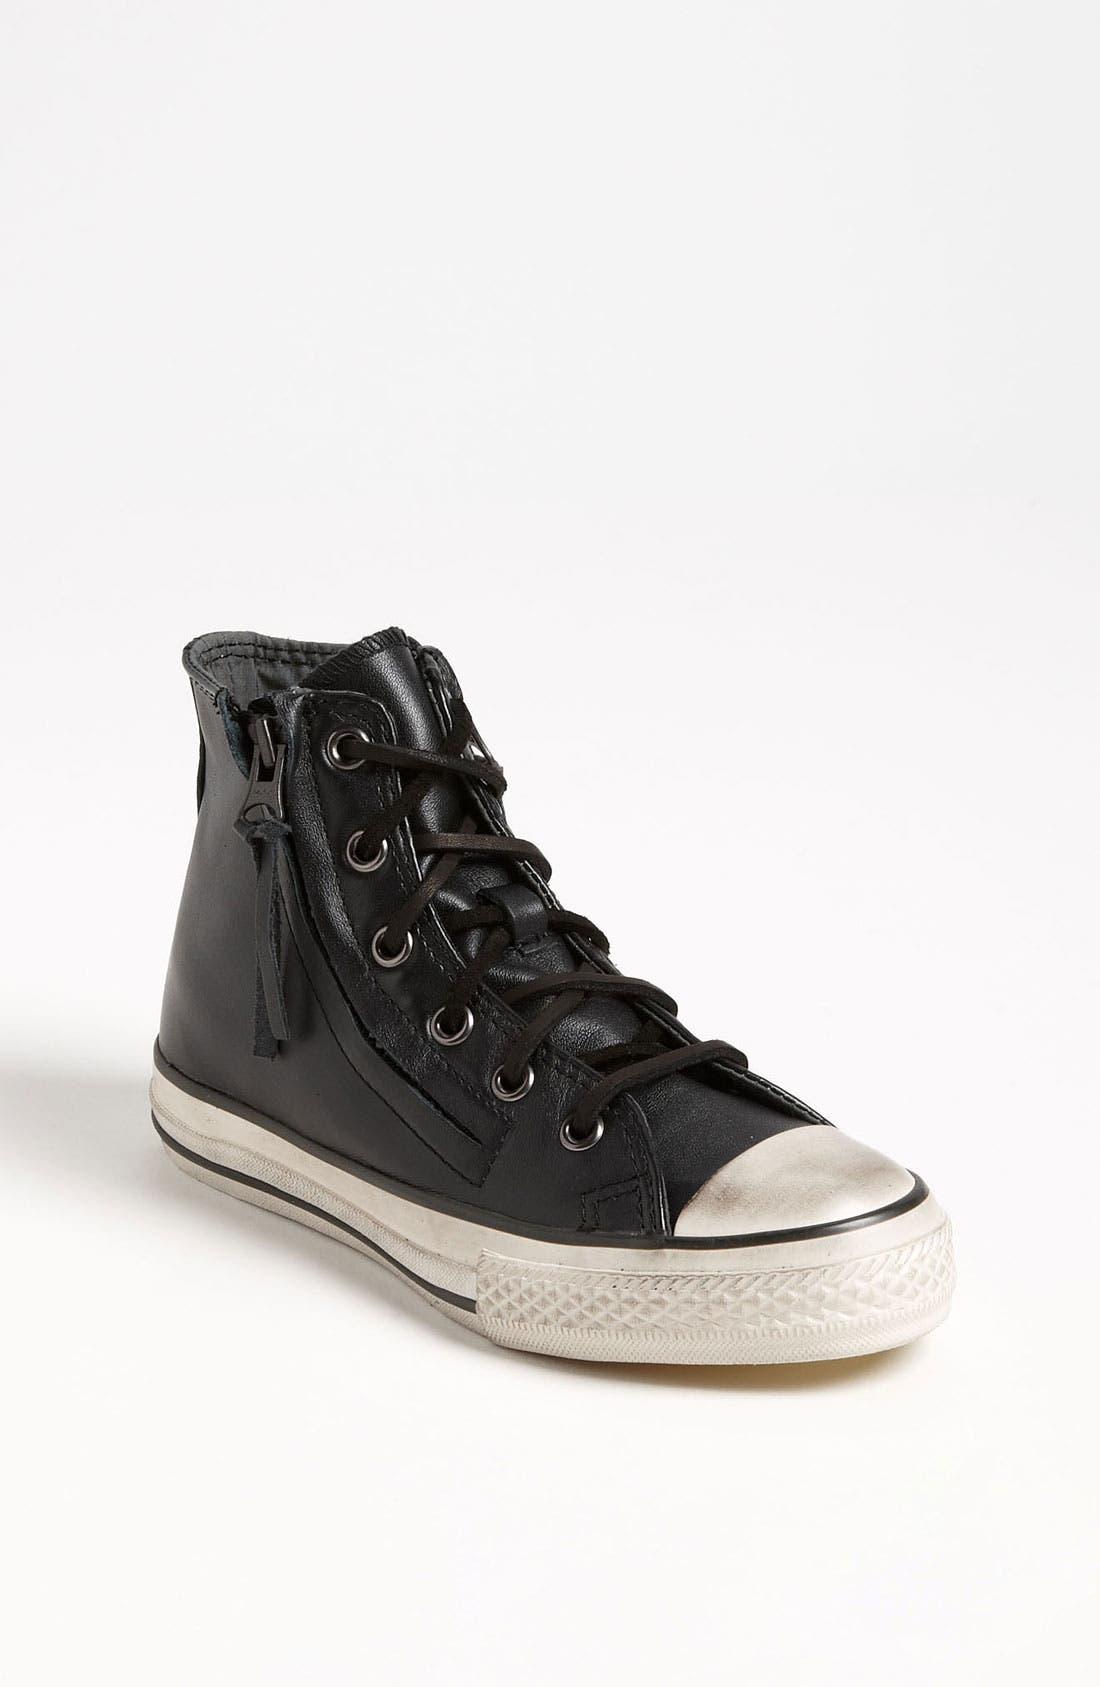 Alternate Image 1 Selected - Converse by John Varvatos 'Double Zip' High Top Sneaker (Toddler, Little Kid & Big Kid)